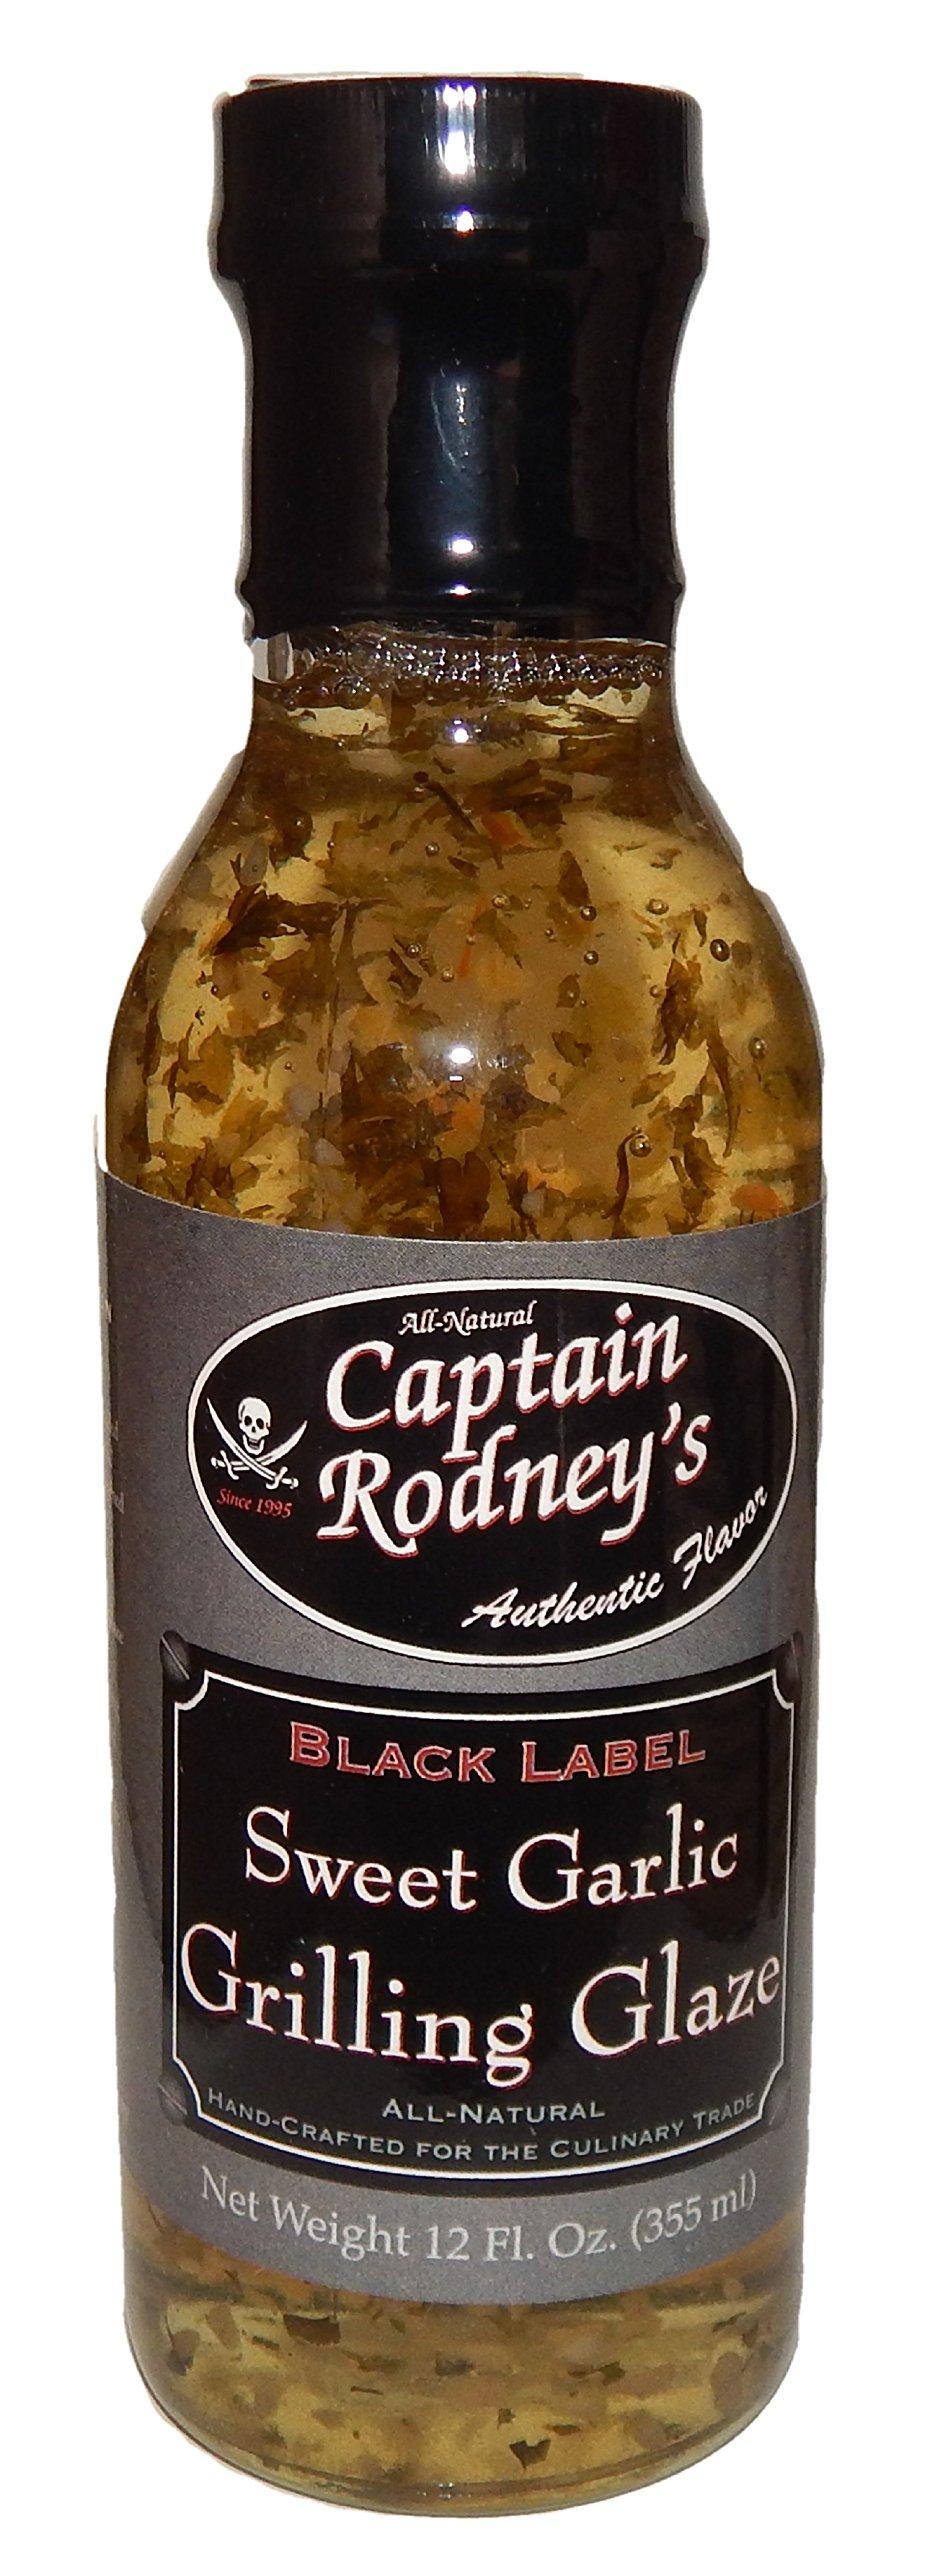 Captain Rodney's Black Label Sweet Garlic Grilling Glaze - 12 Ounce